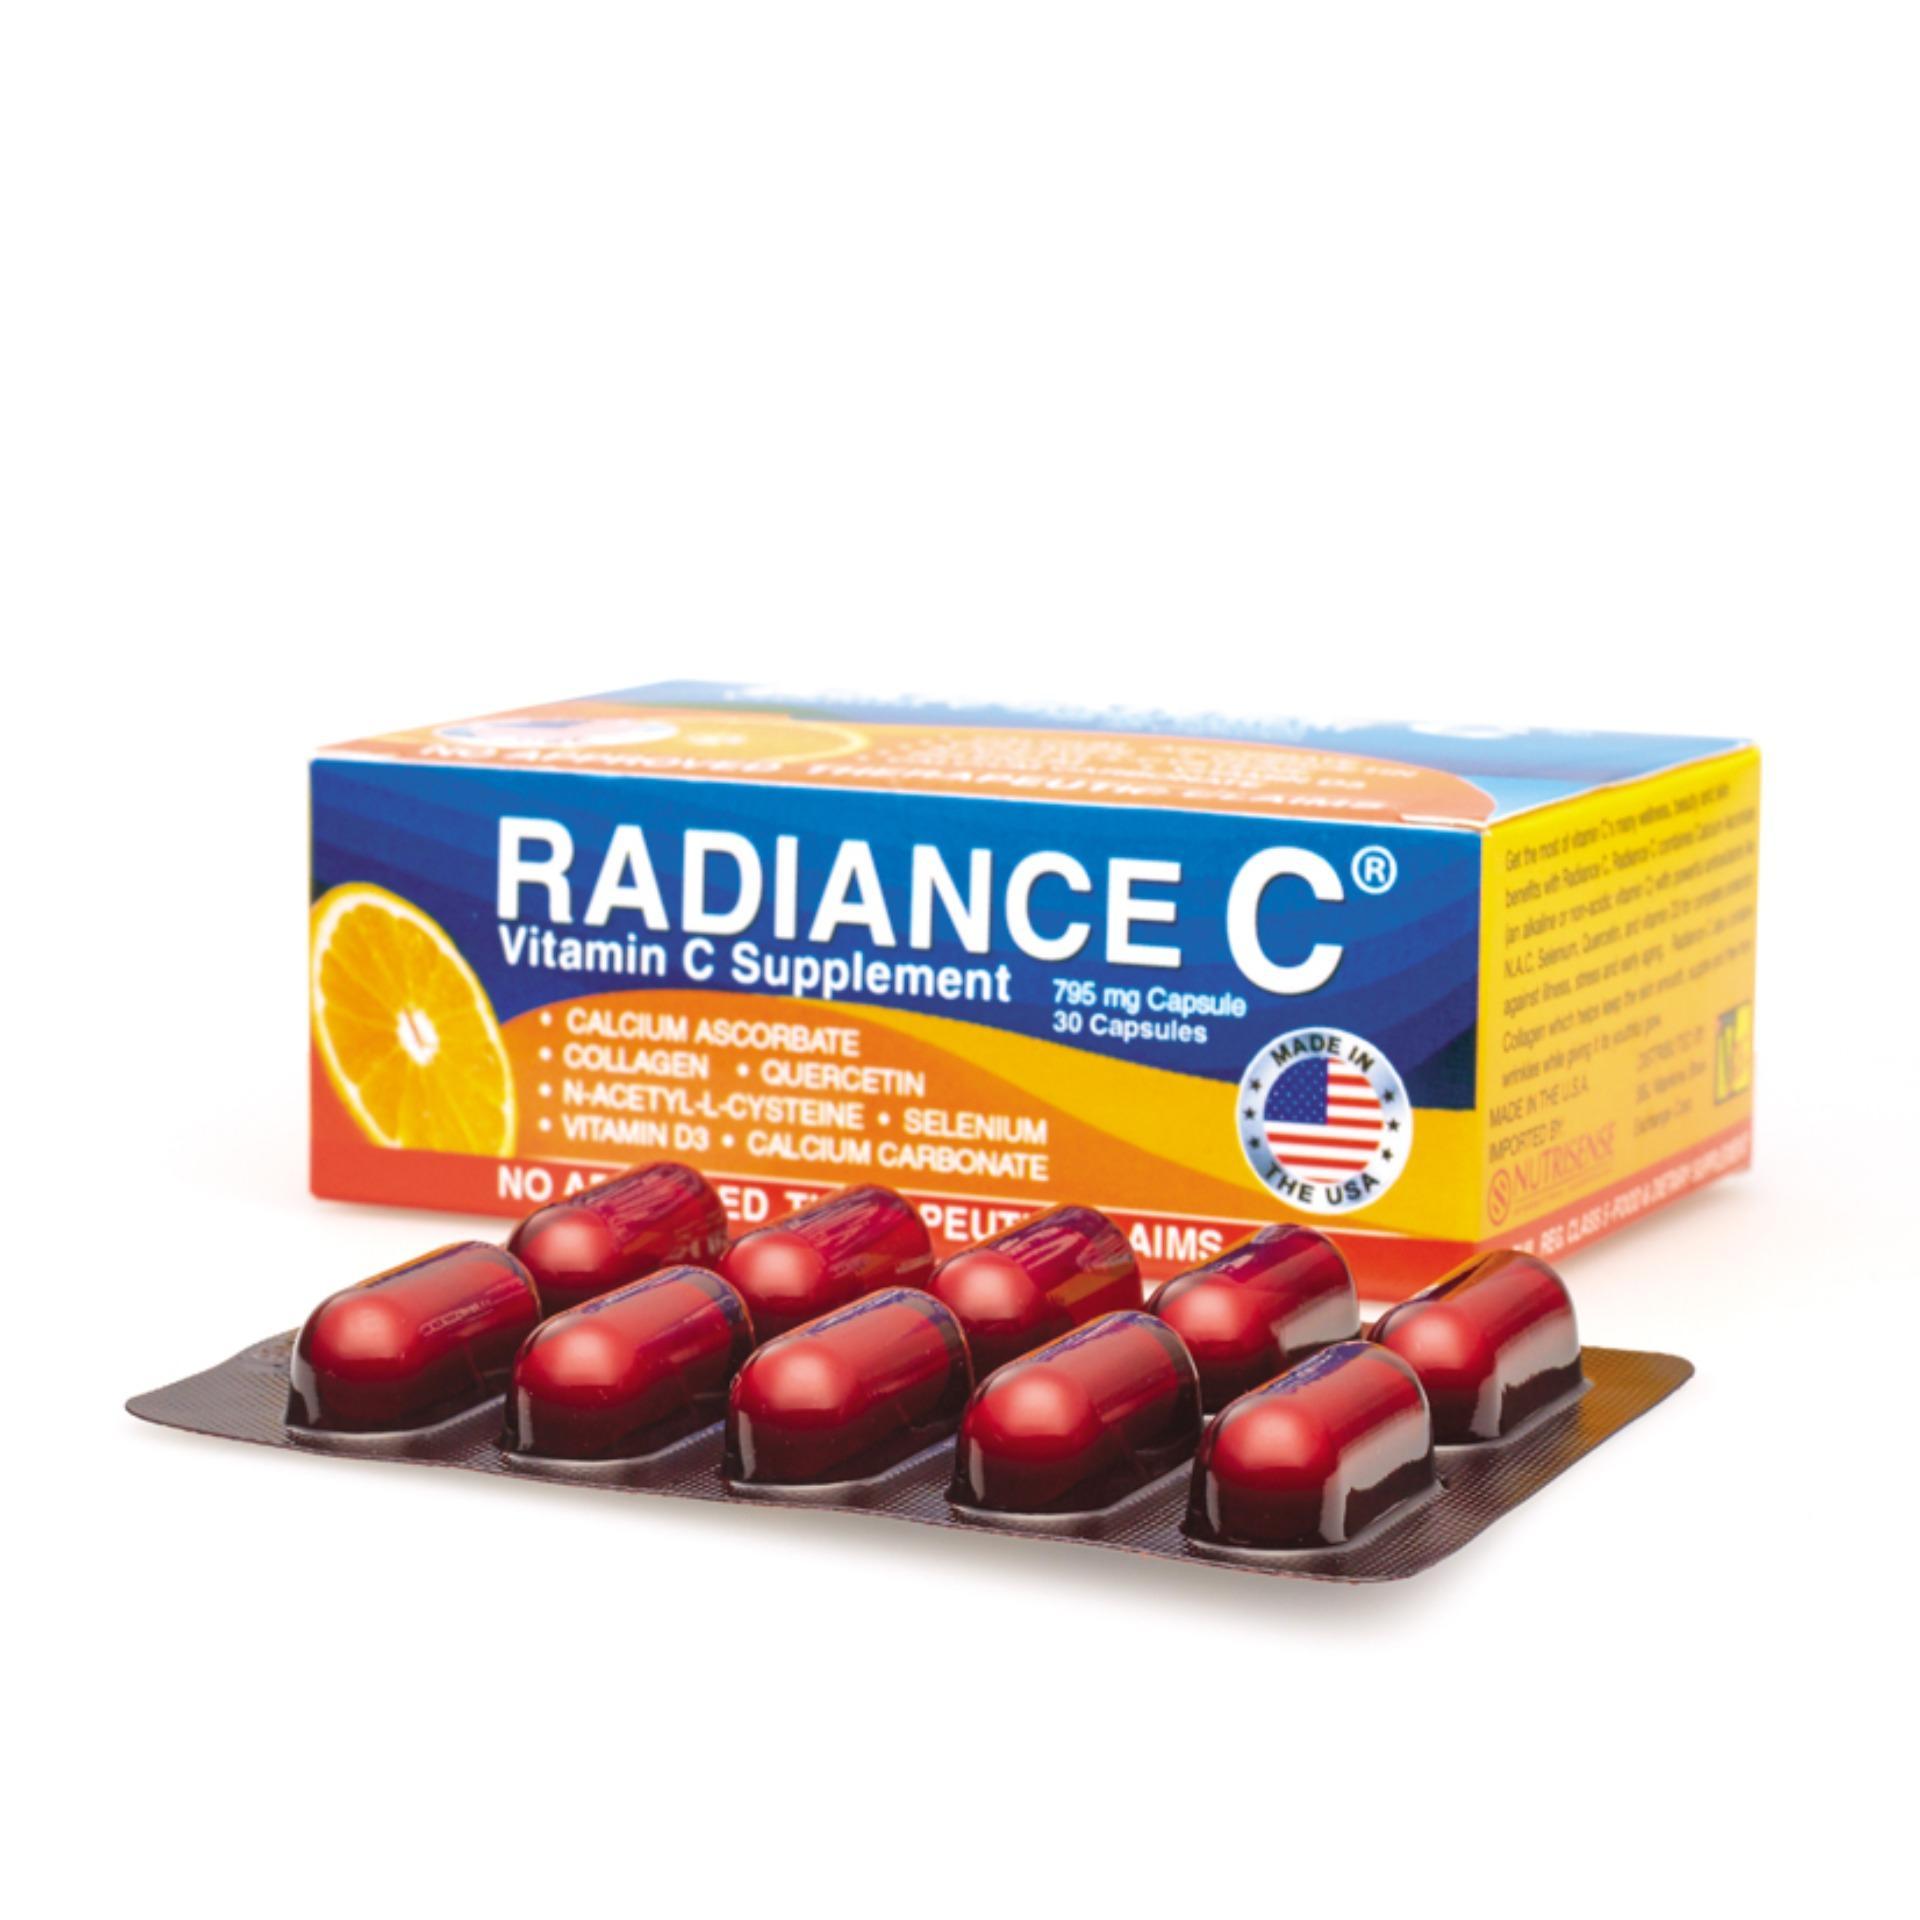 MSE Radiance Vitamins C Supplement Capsules of 30